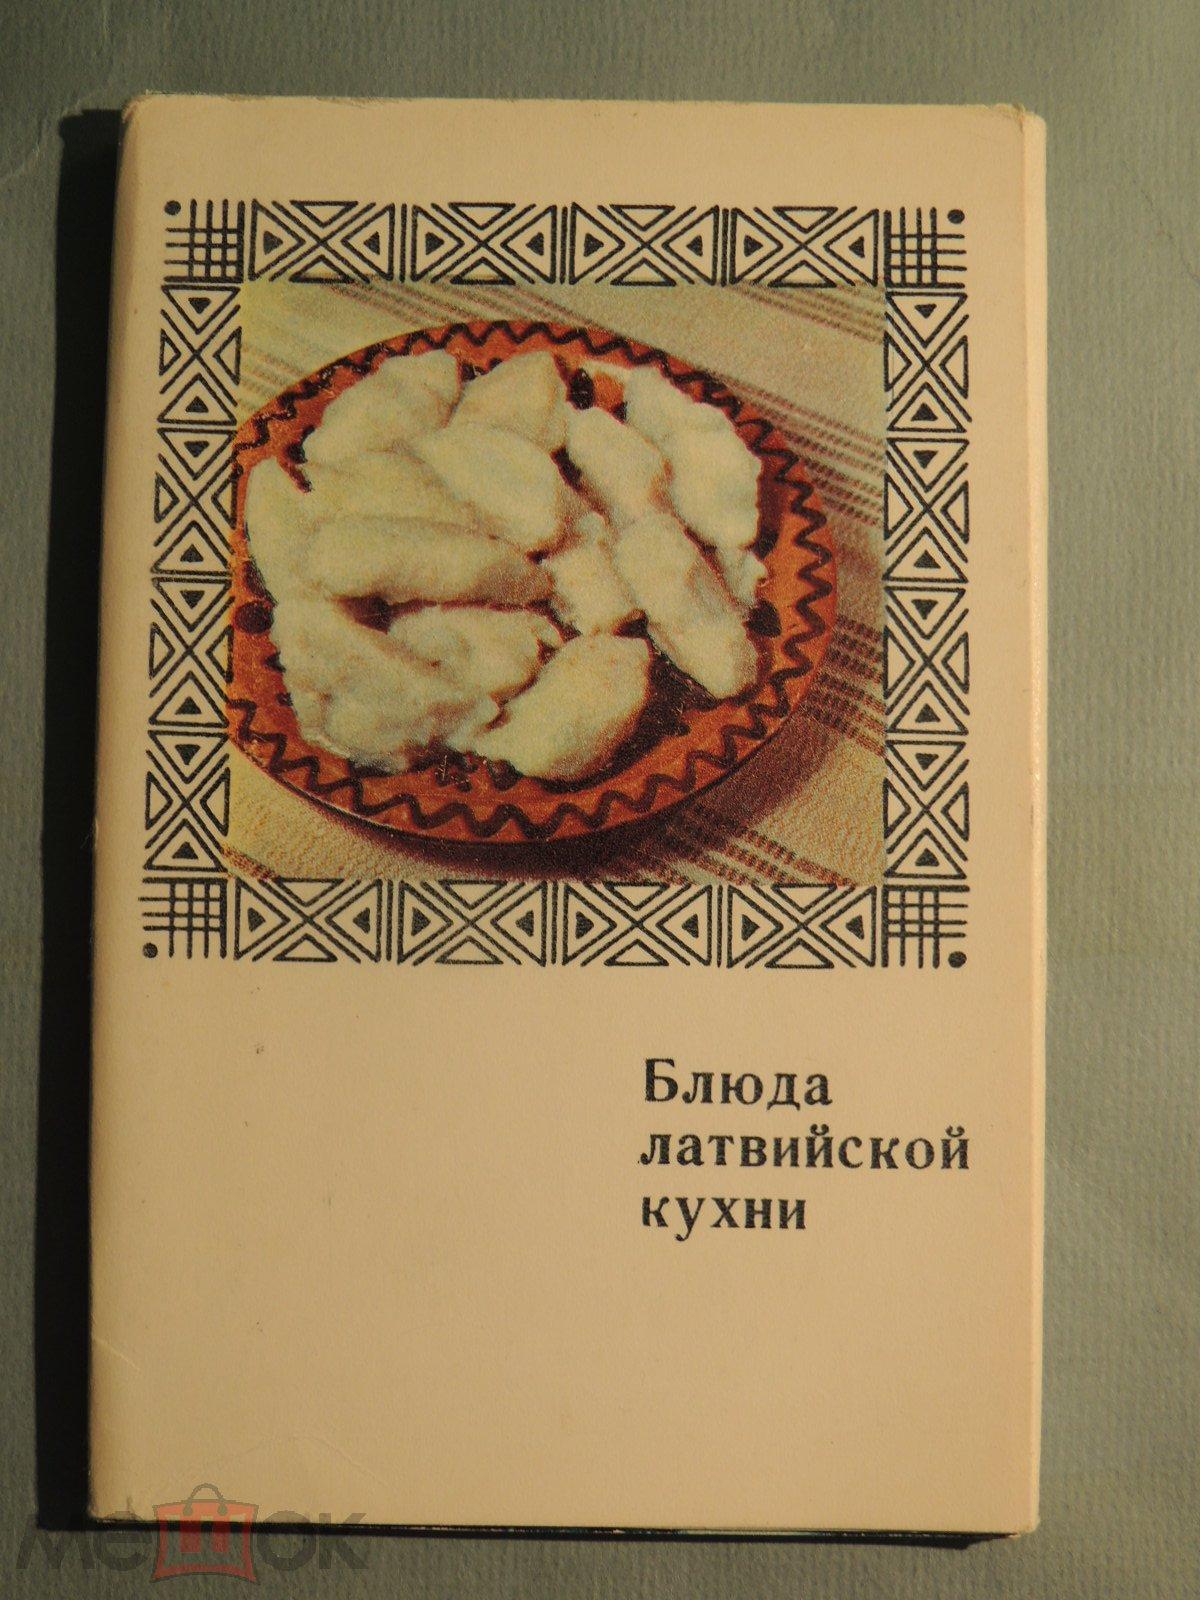 Блюда кухни комплект открыток